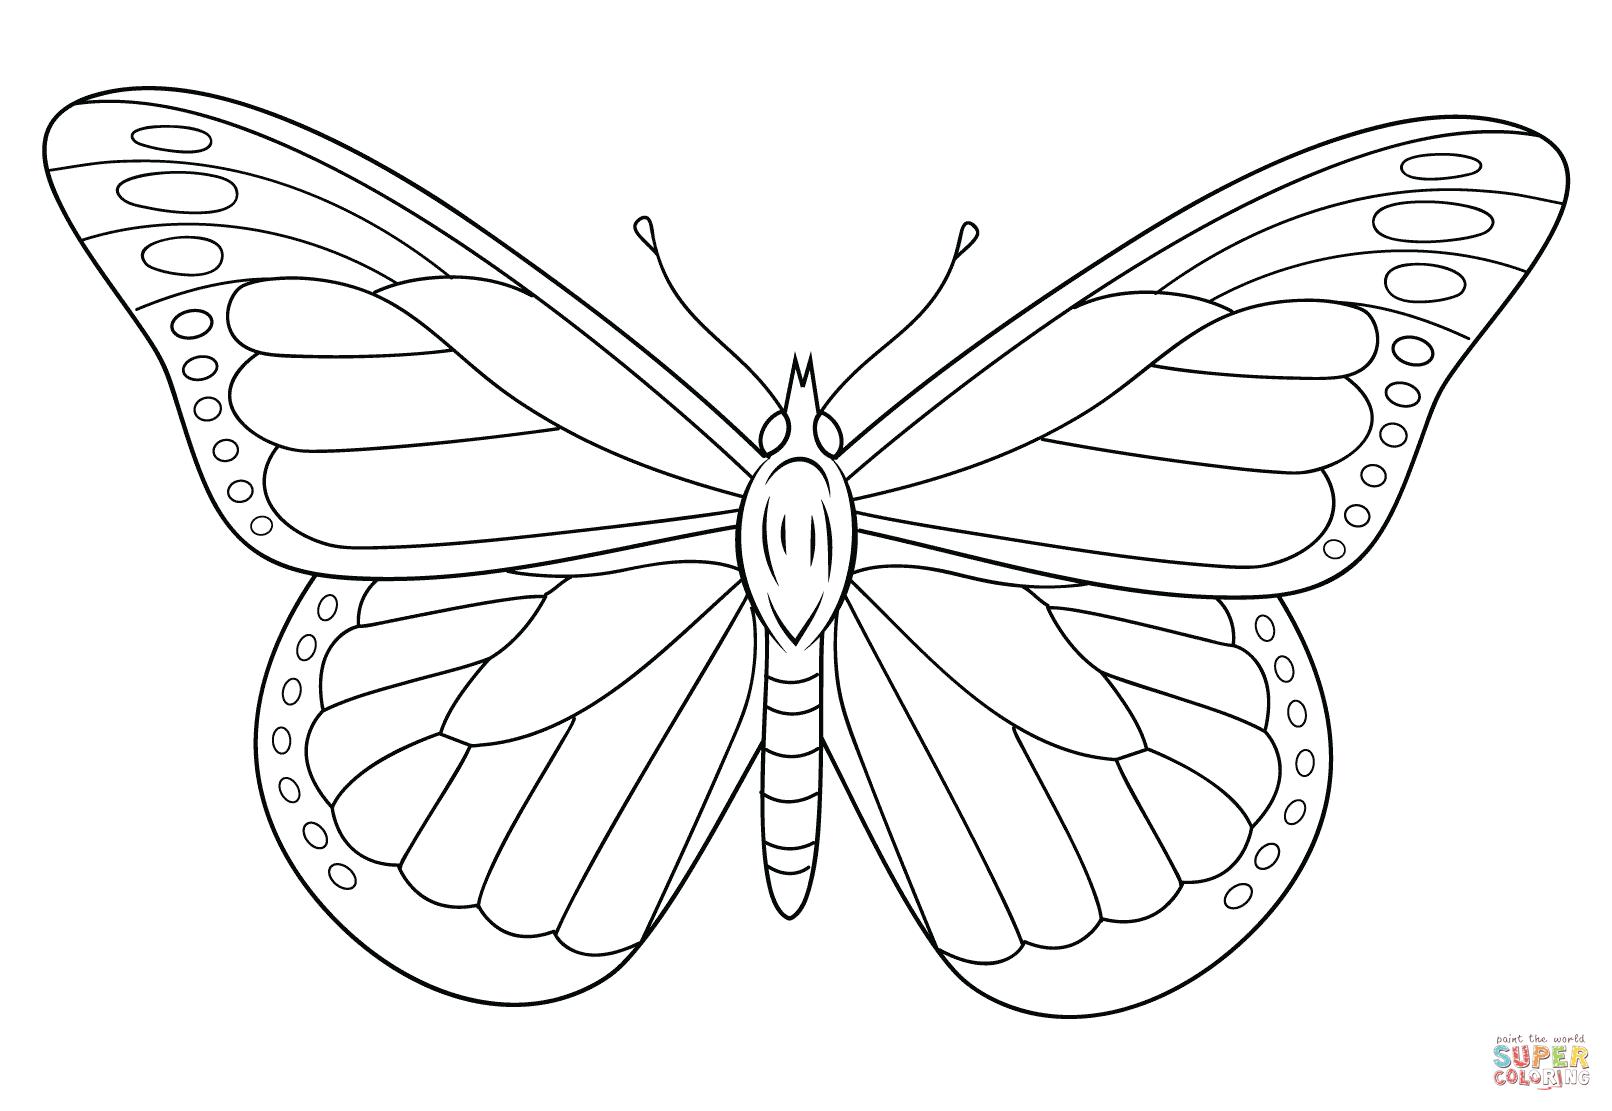 Gratis Ausmalbilder Schmetterling : Resultado De Imagen De Dibujo Mariposa Ilu Pinterest